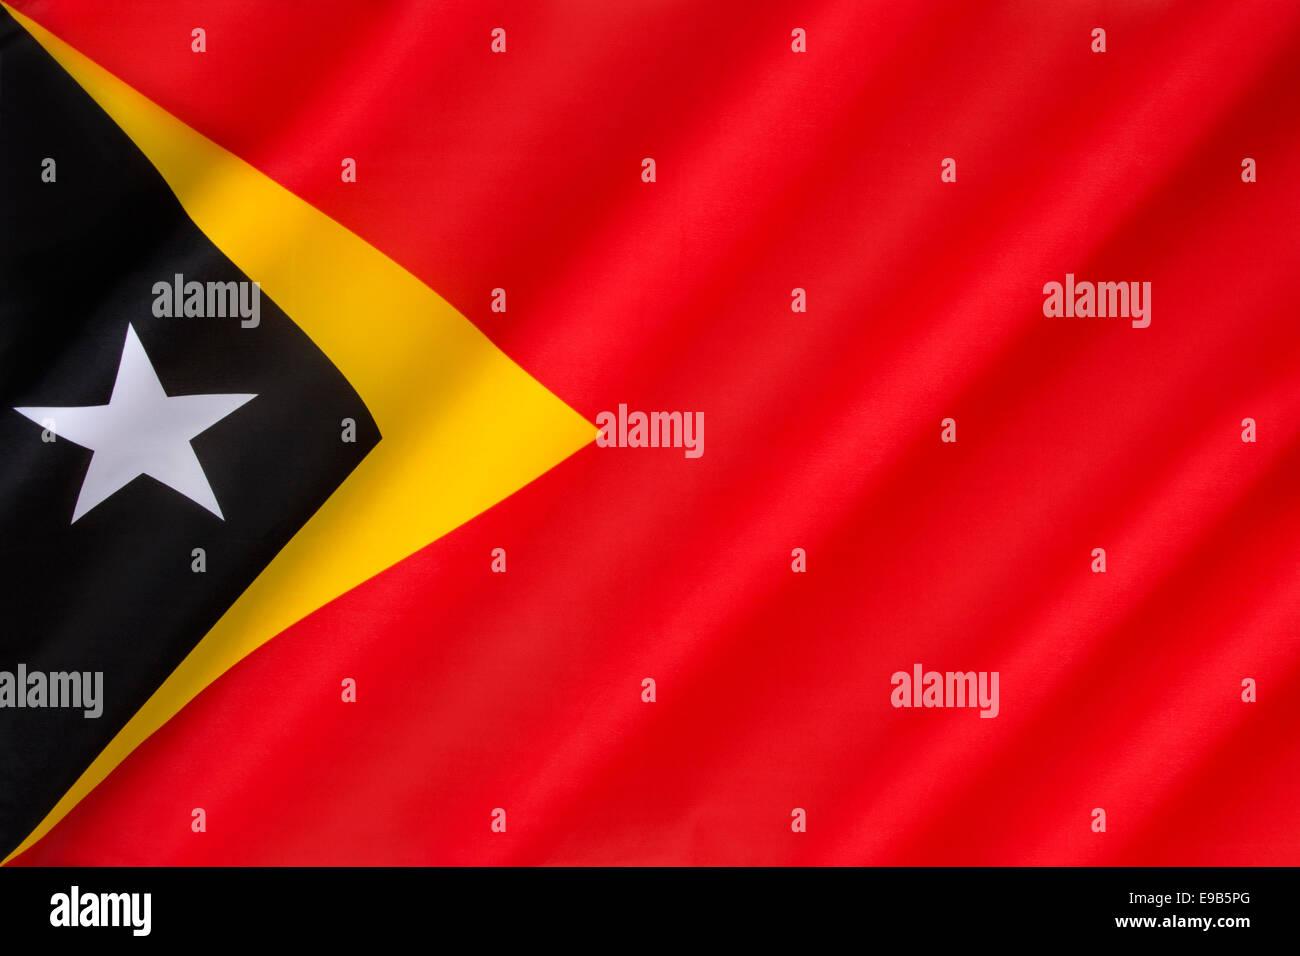 Flag of the Democratic Republic of Timor-Leste - East Timor - Stock Image